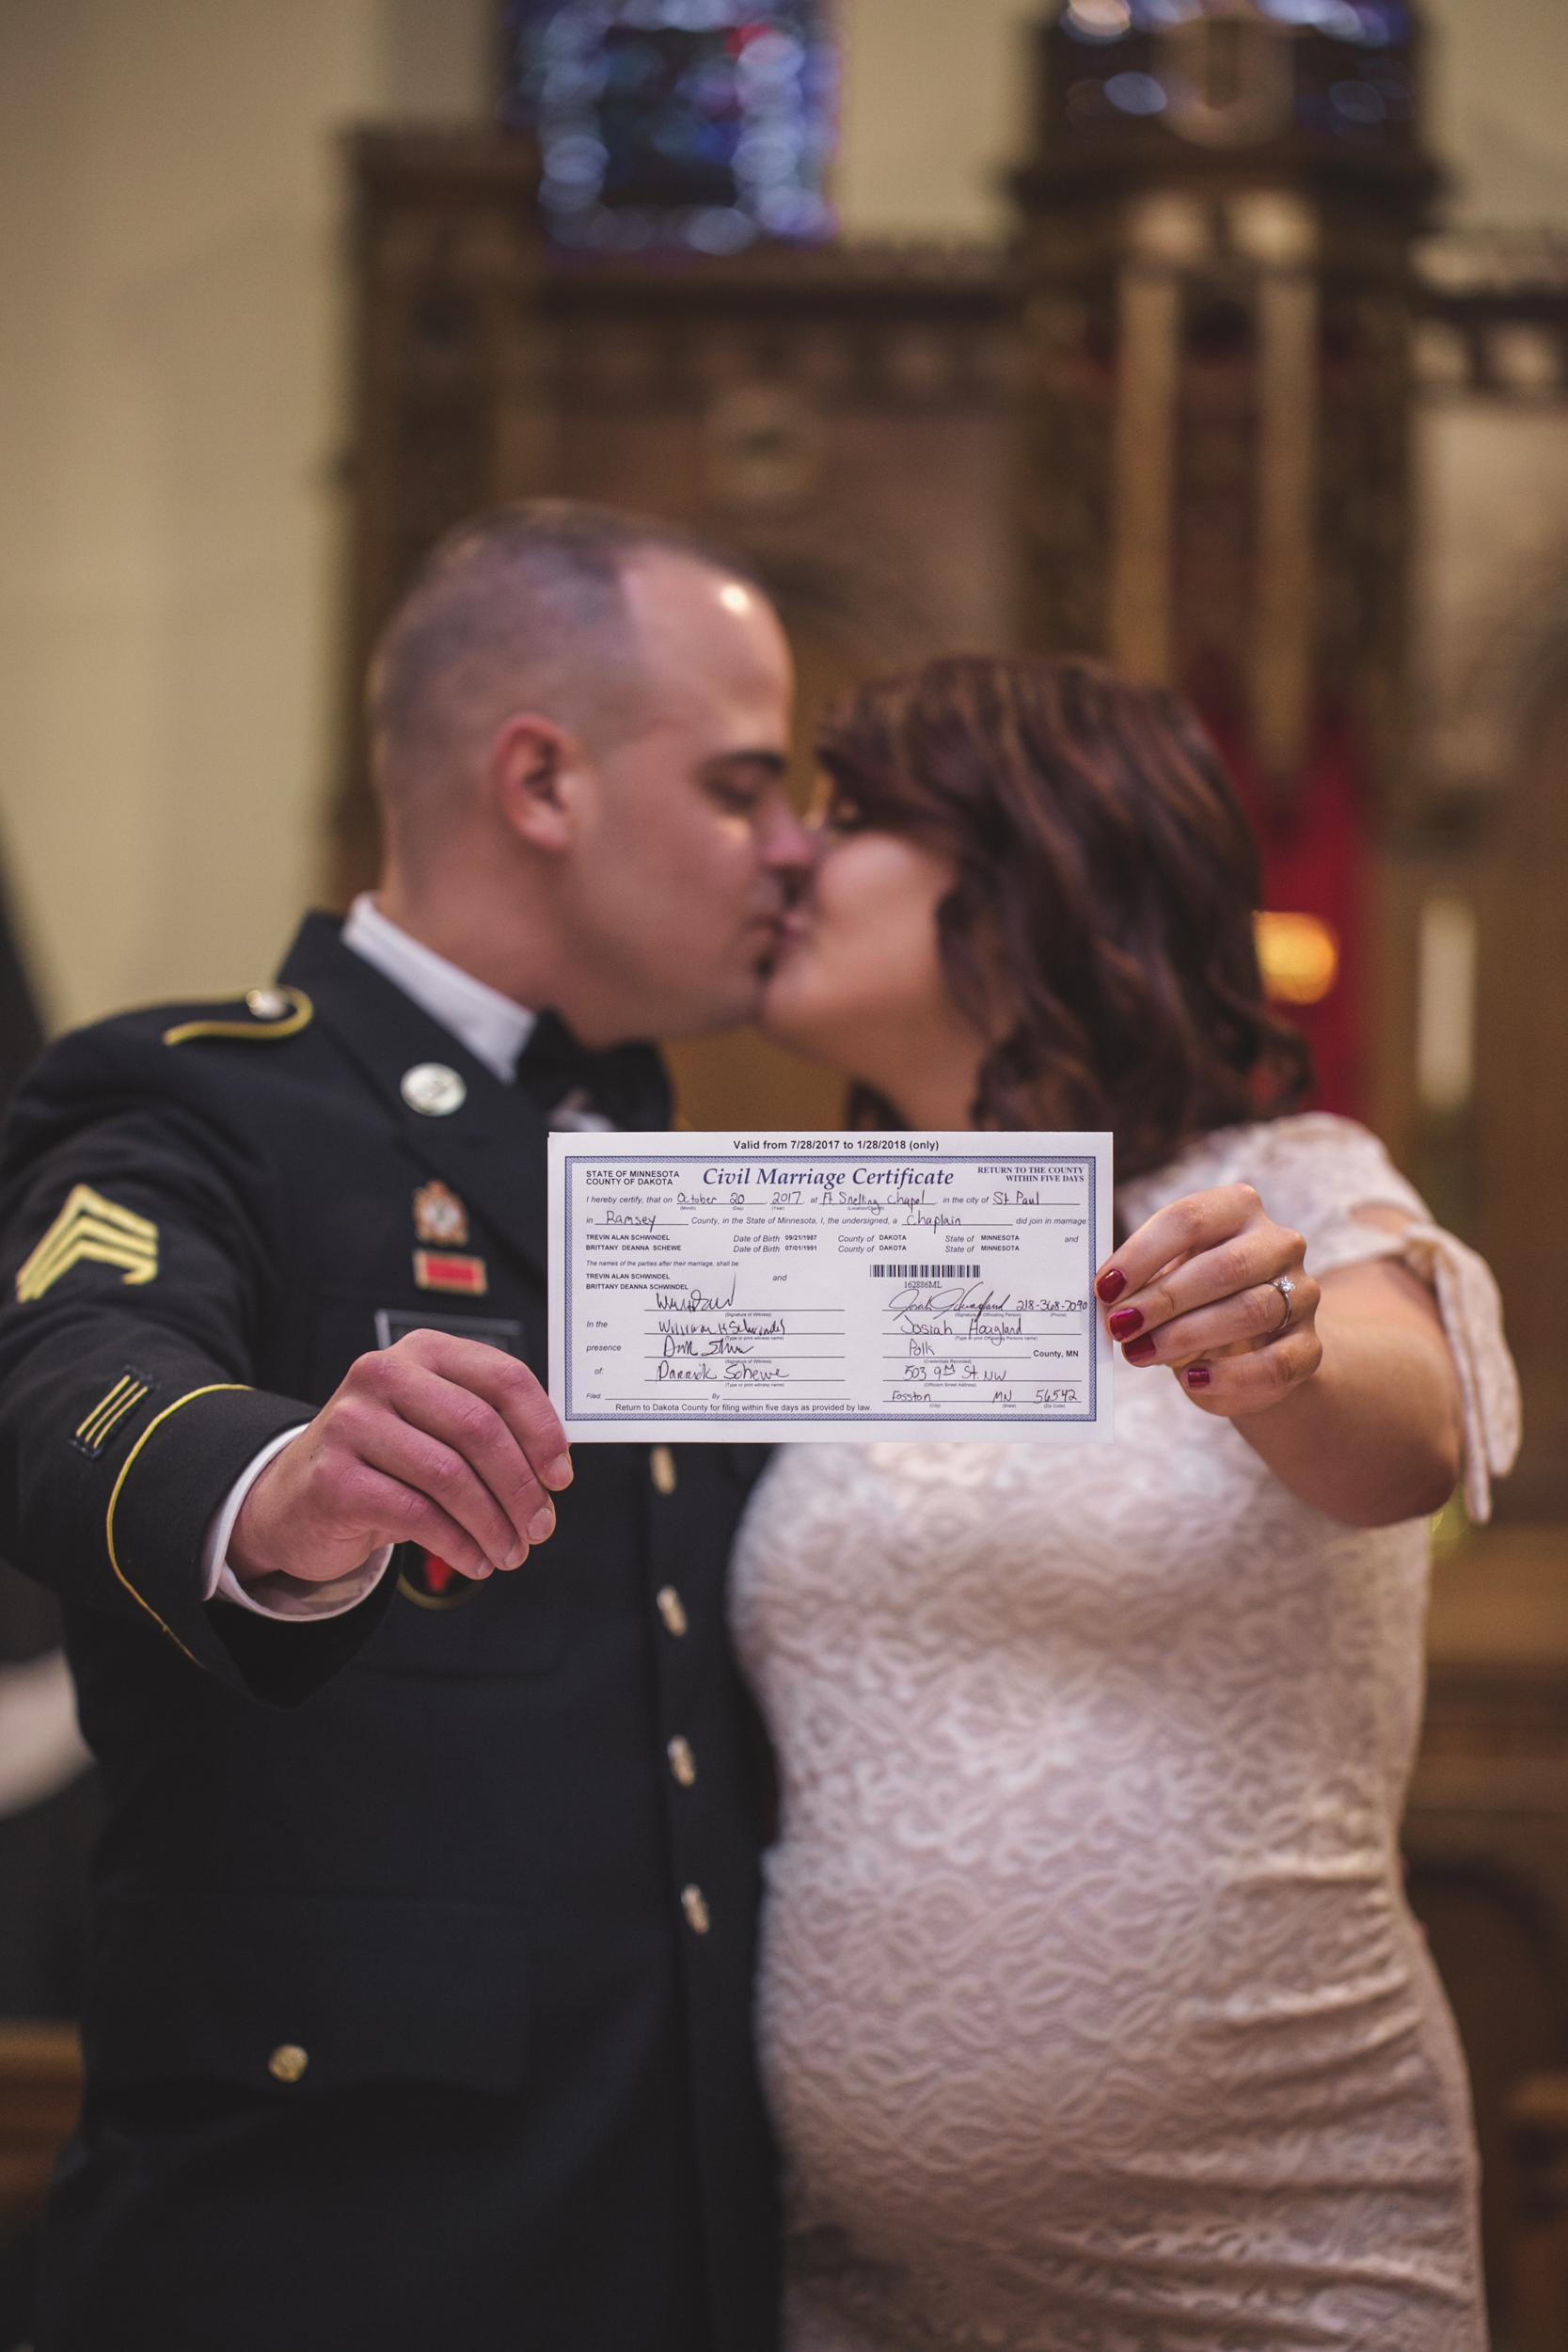 Fort Snelling Elopement St. Paul, MN, Fort Snelling Elopement, Military Elopement, Intimate Military Wedding, intimate elopement wedding-www.rachelsmak.com32.jpg